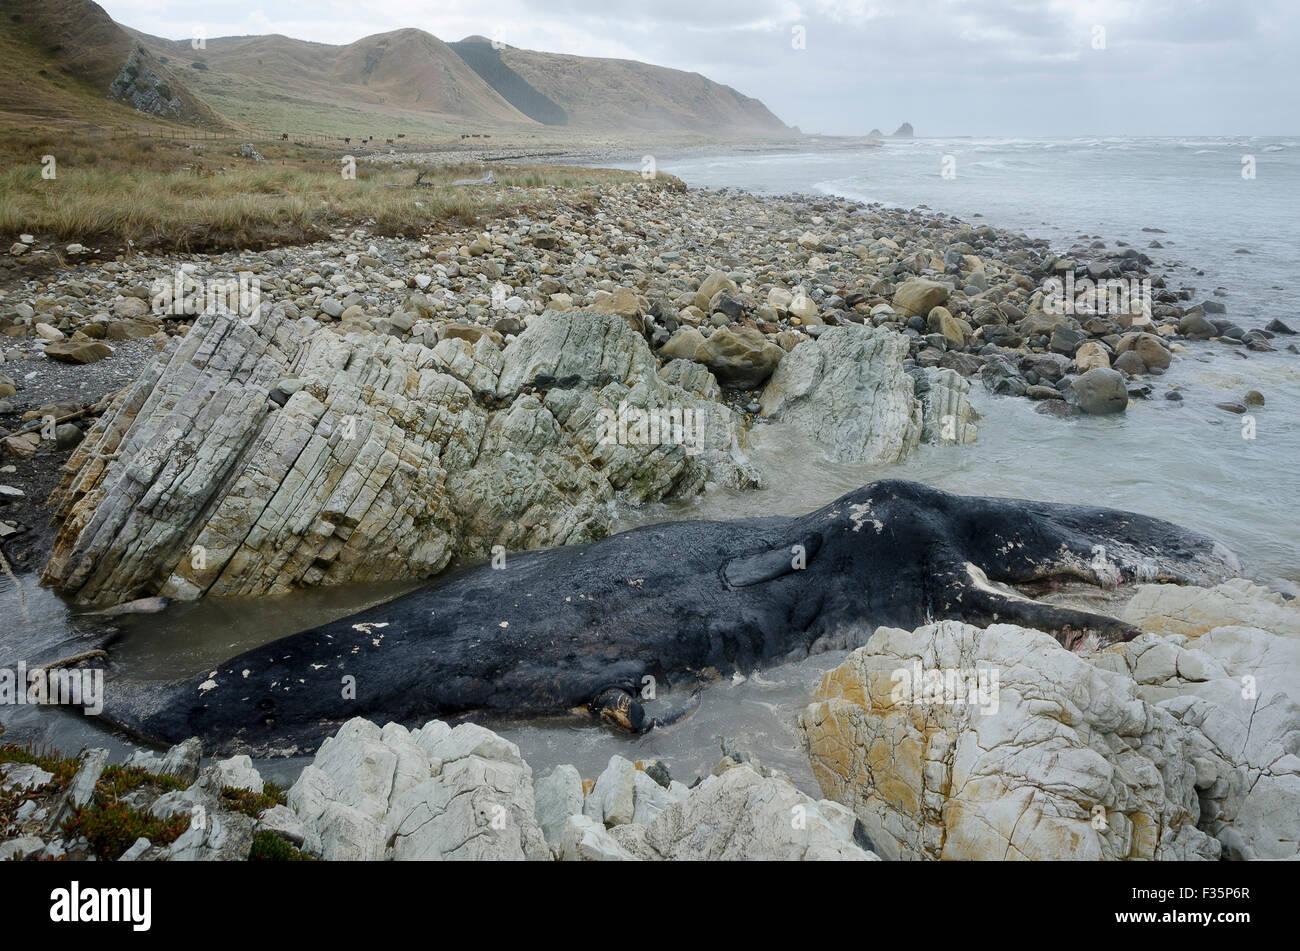 burial Dauphin island sperm whale